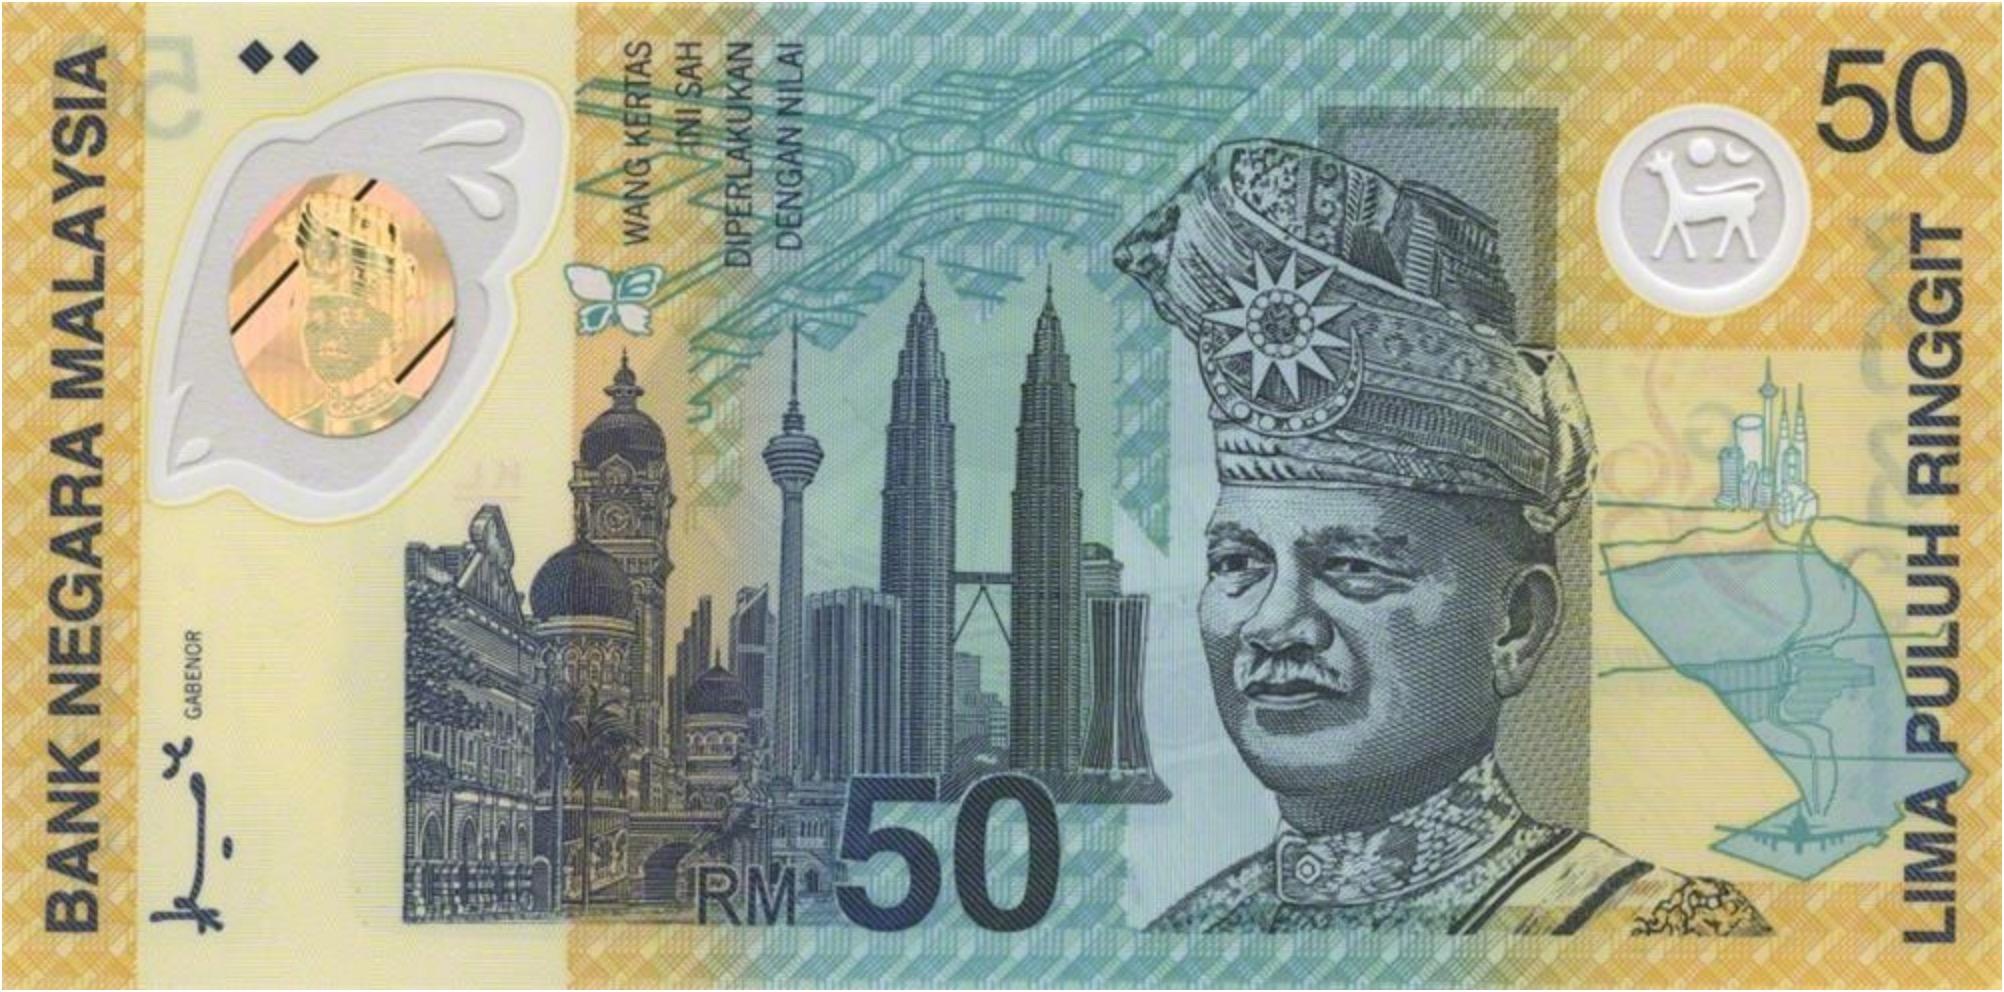 50 Malaysian Ringgit (1998 Kuala Lumpur XVI Commonwealth Games)